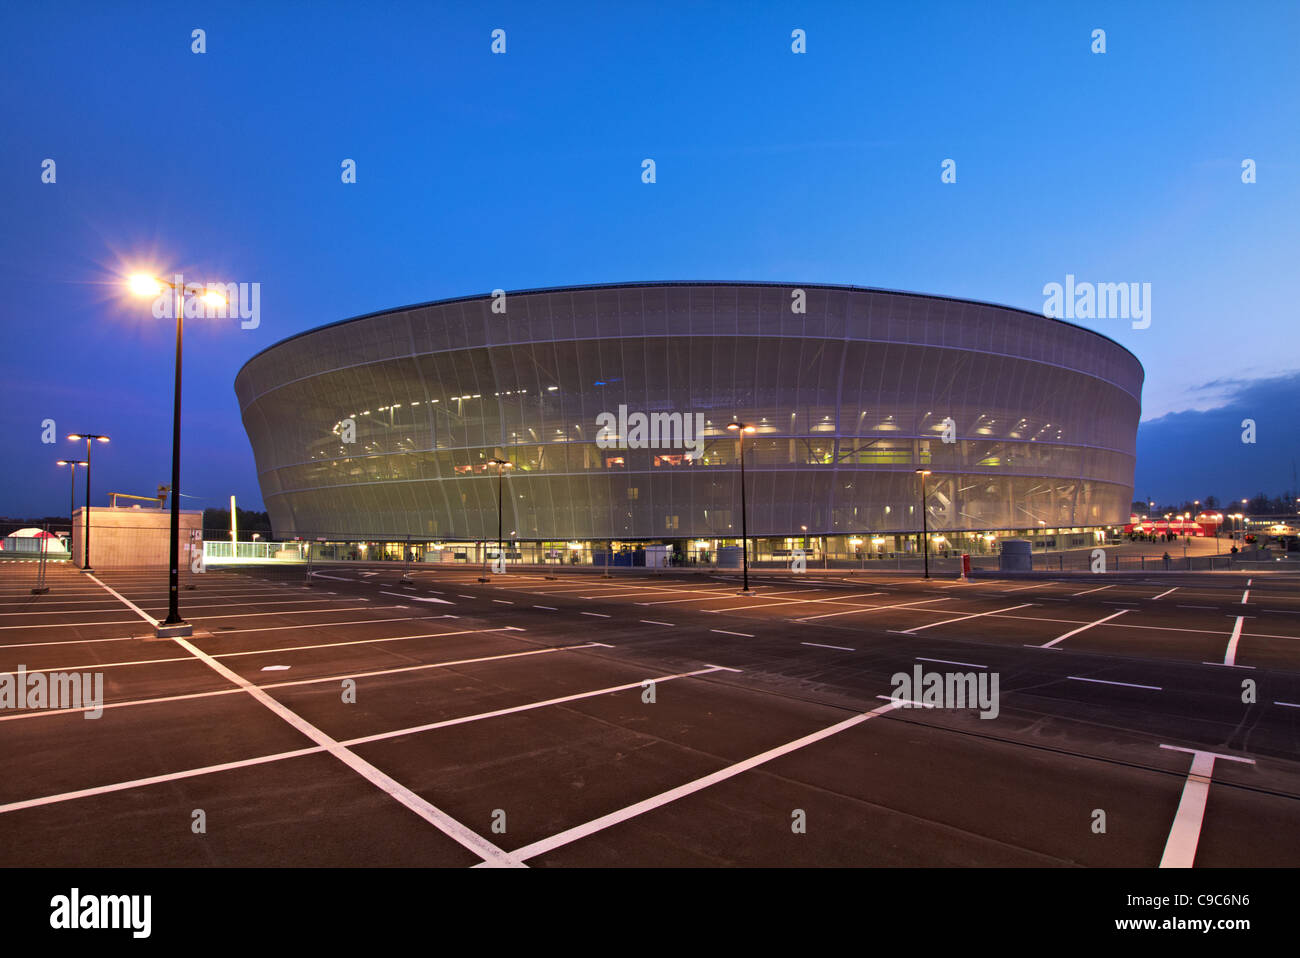 new stadium in Wroclaw, Poland - Stock Image